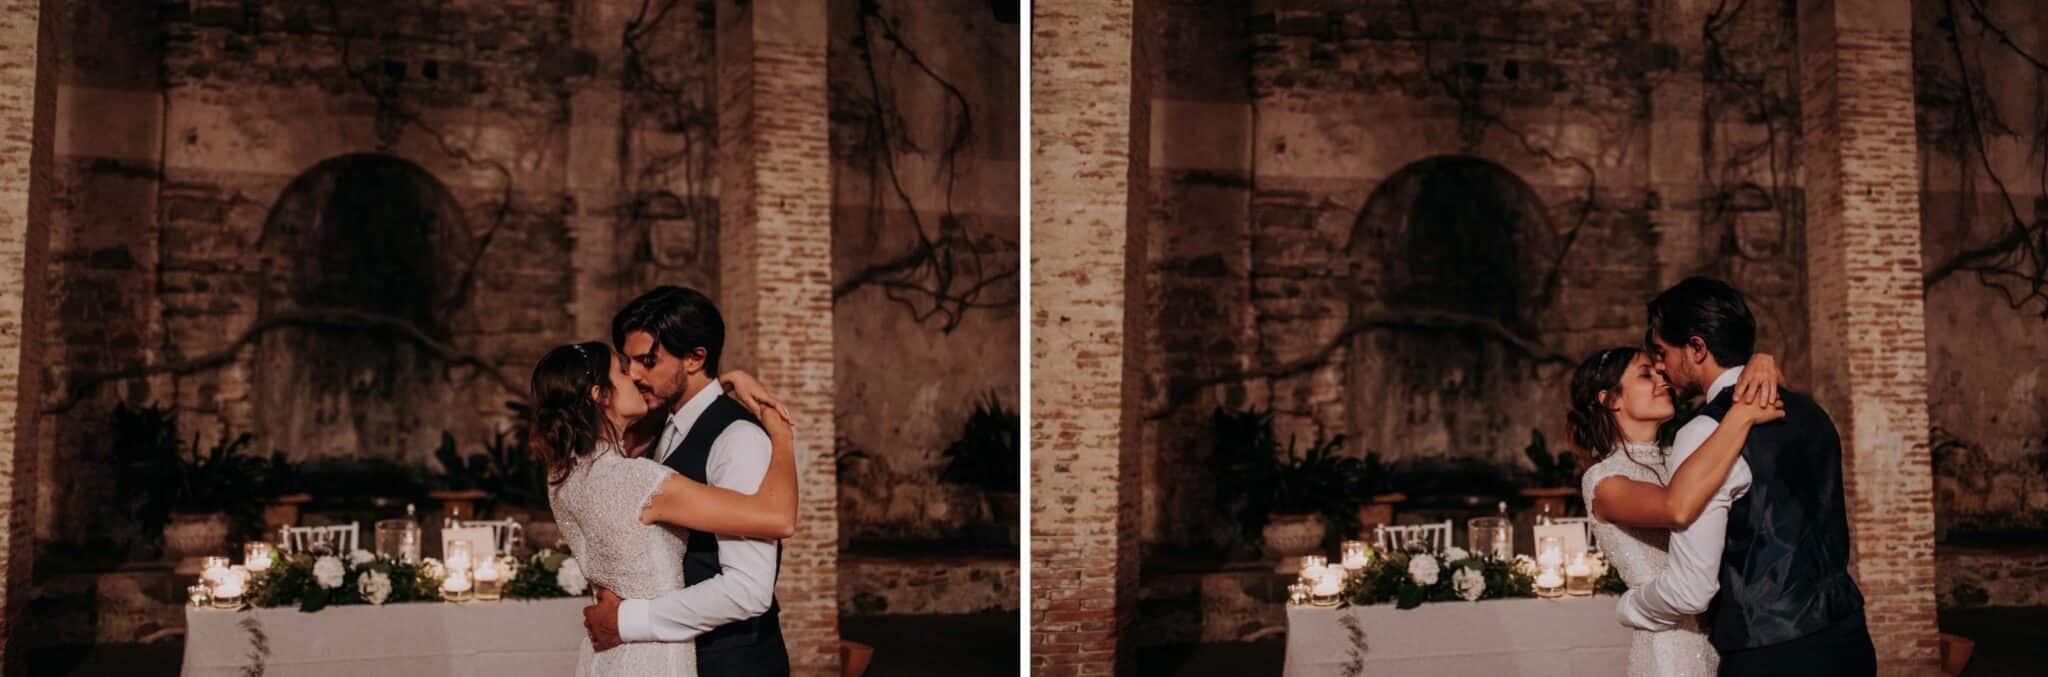 dance at Villa Grabau in Lucca